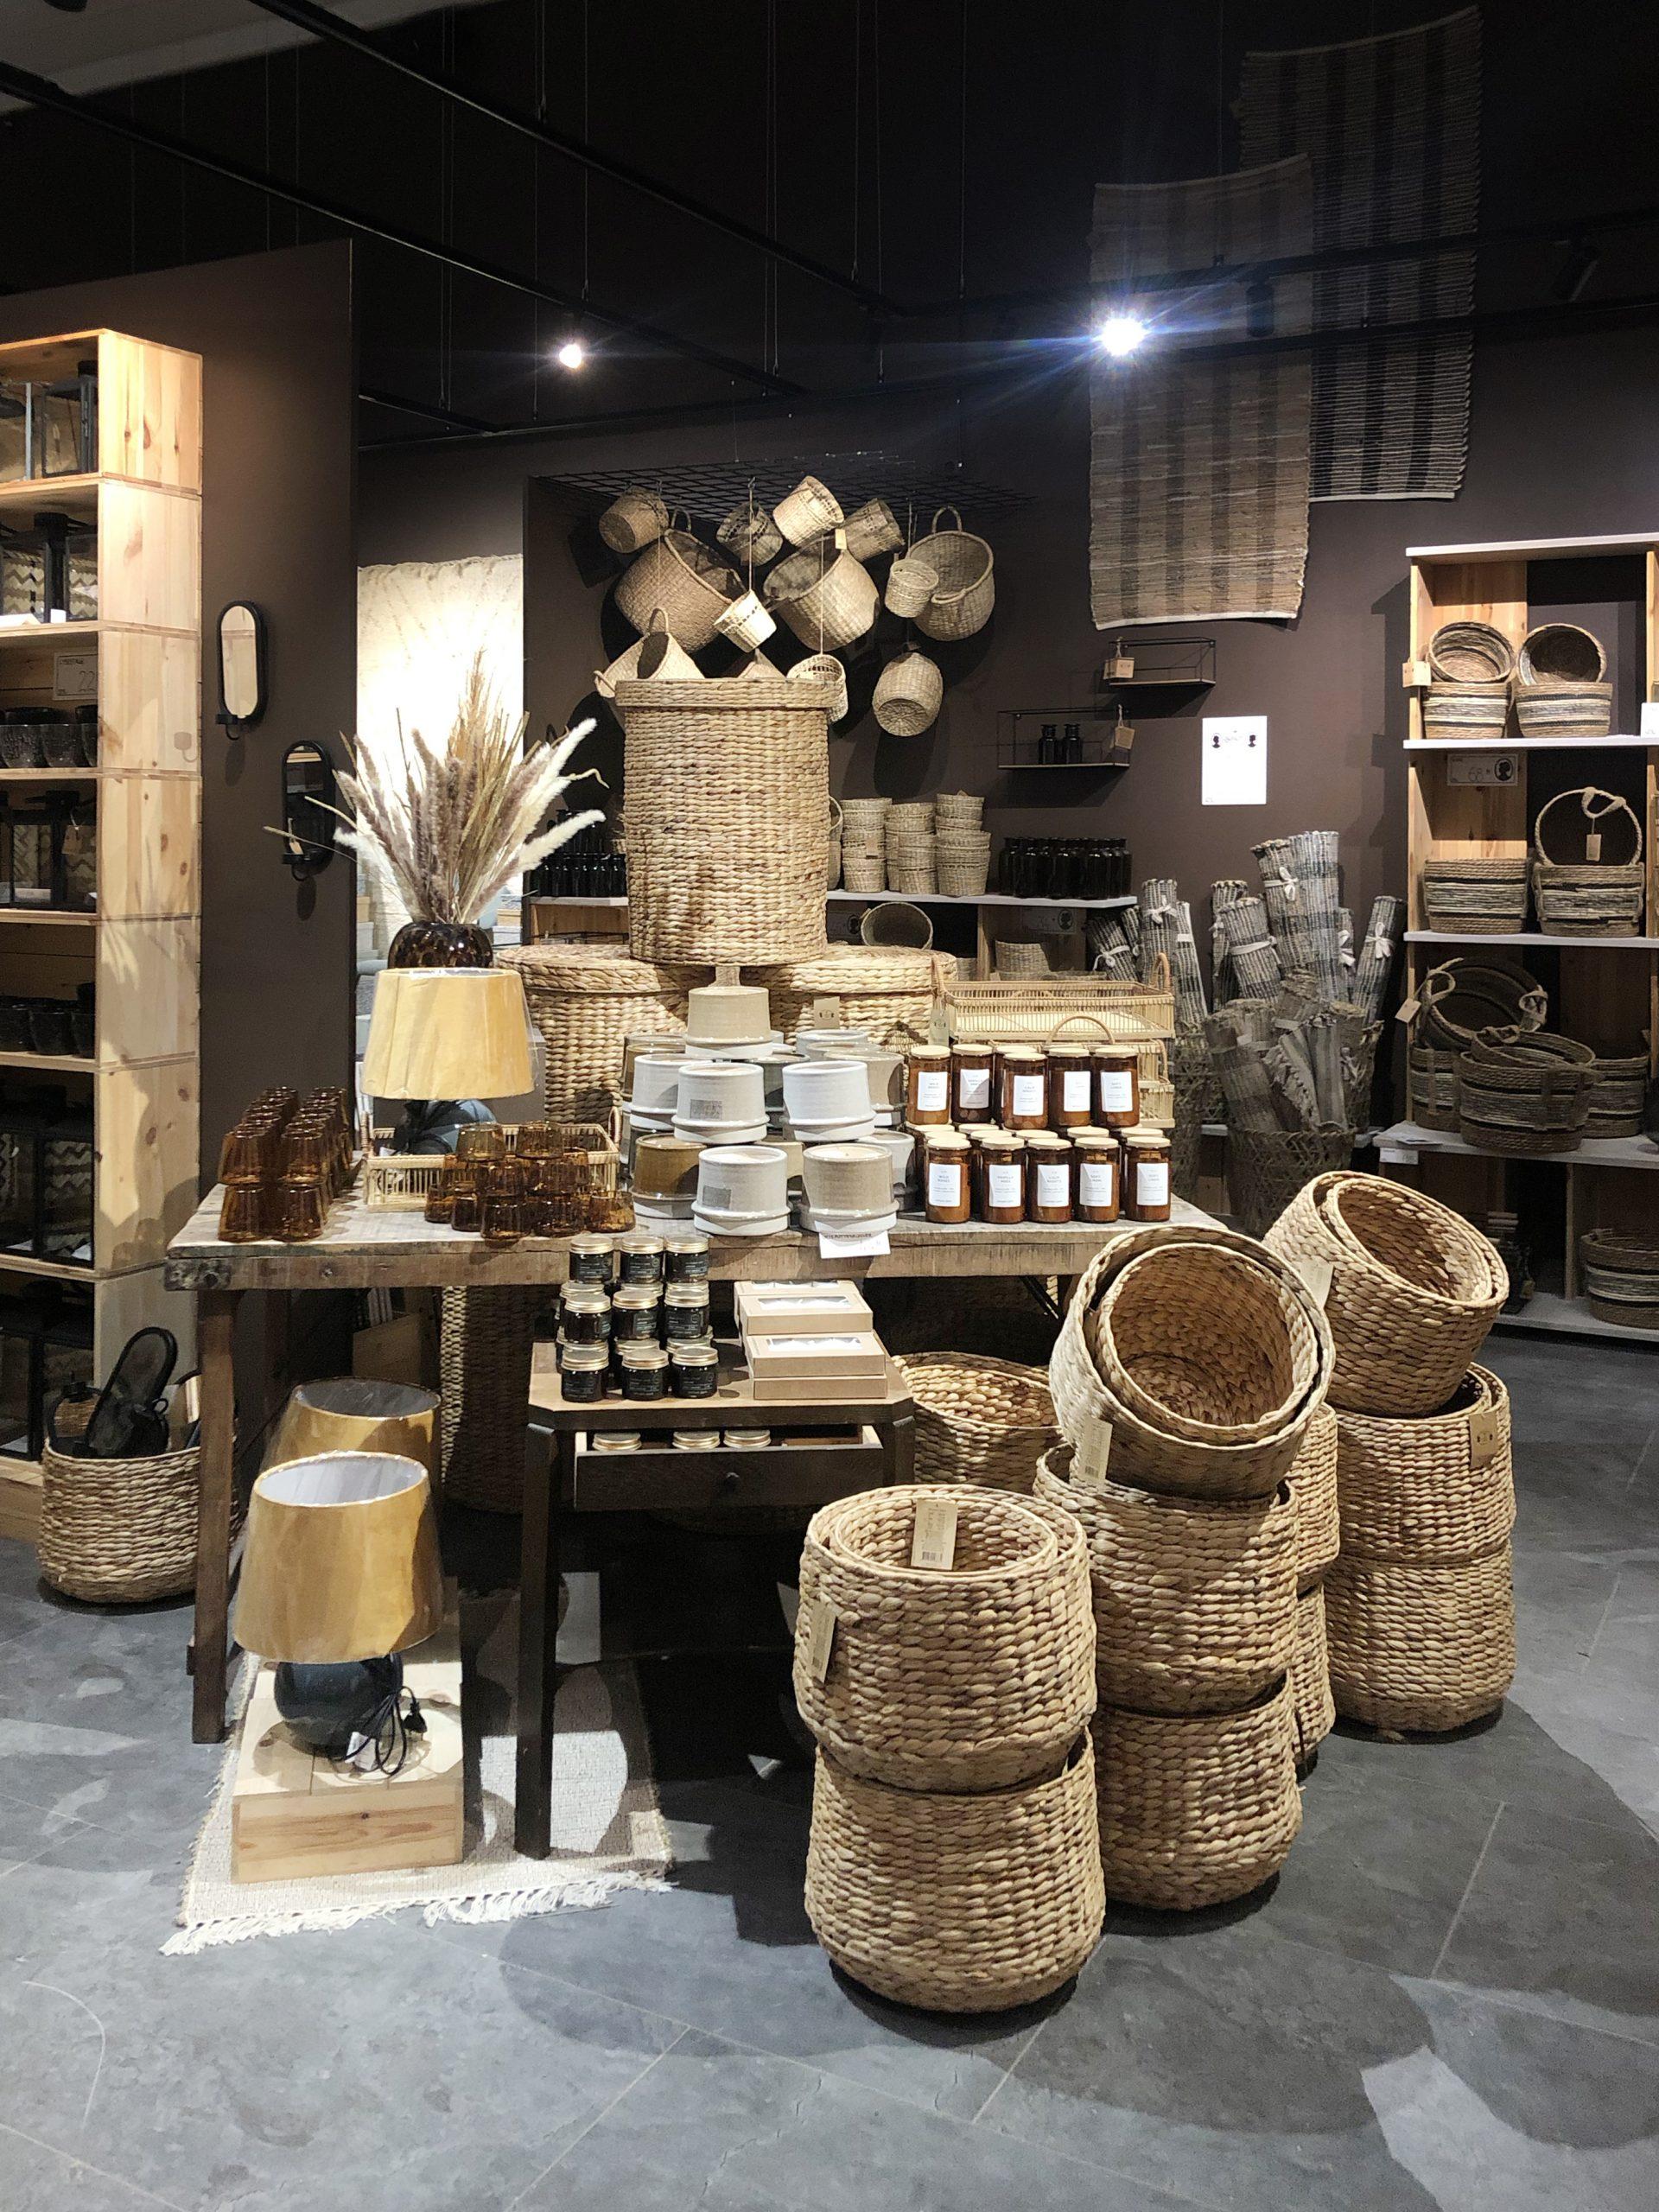 Kæmpe butik: Verdens største Søstrene Grene-butik åbner midt i Aarhus